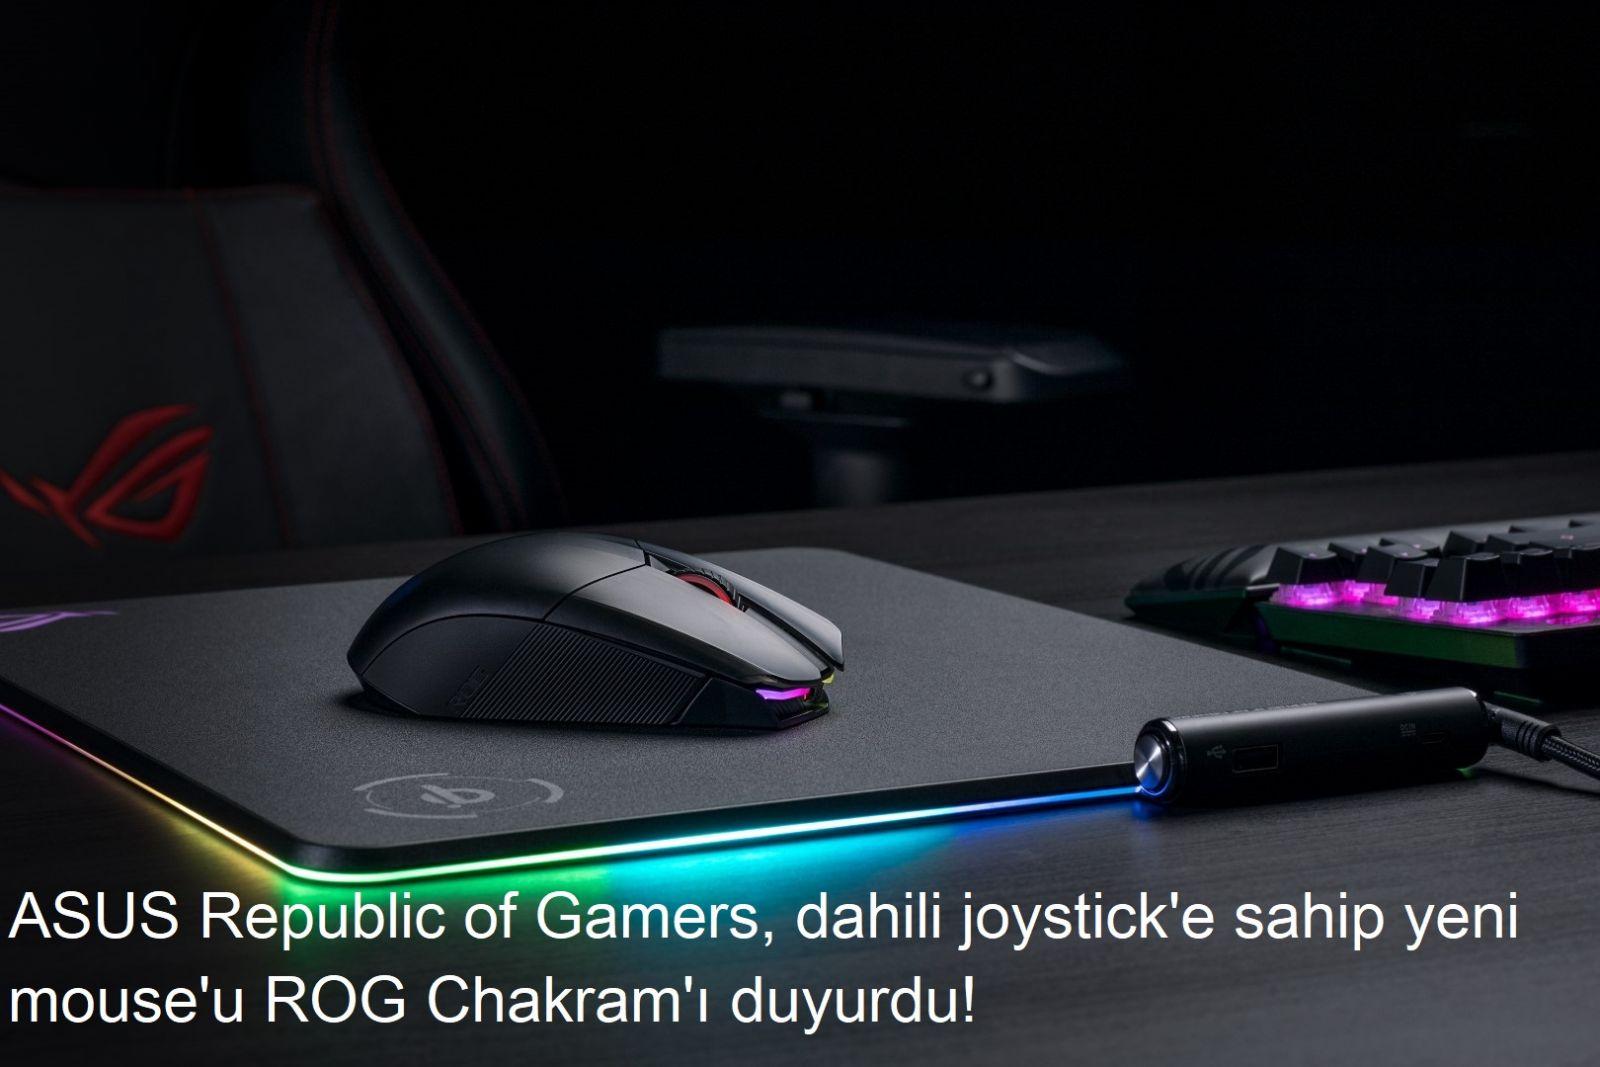 tekirdağ ASUS Republic of Gamers, dahili joystick'e sahip yeni mouse'u ROG Chakram'ı duyurdu!